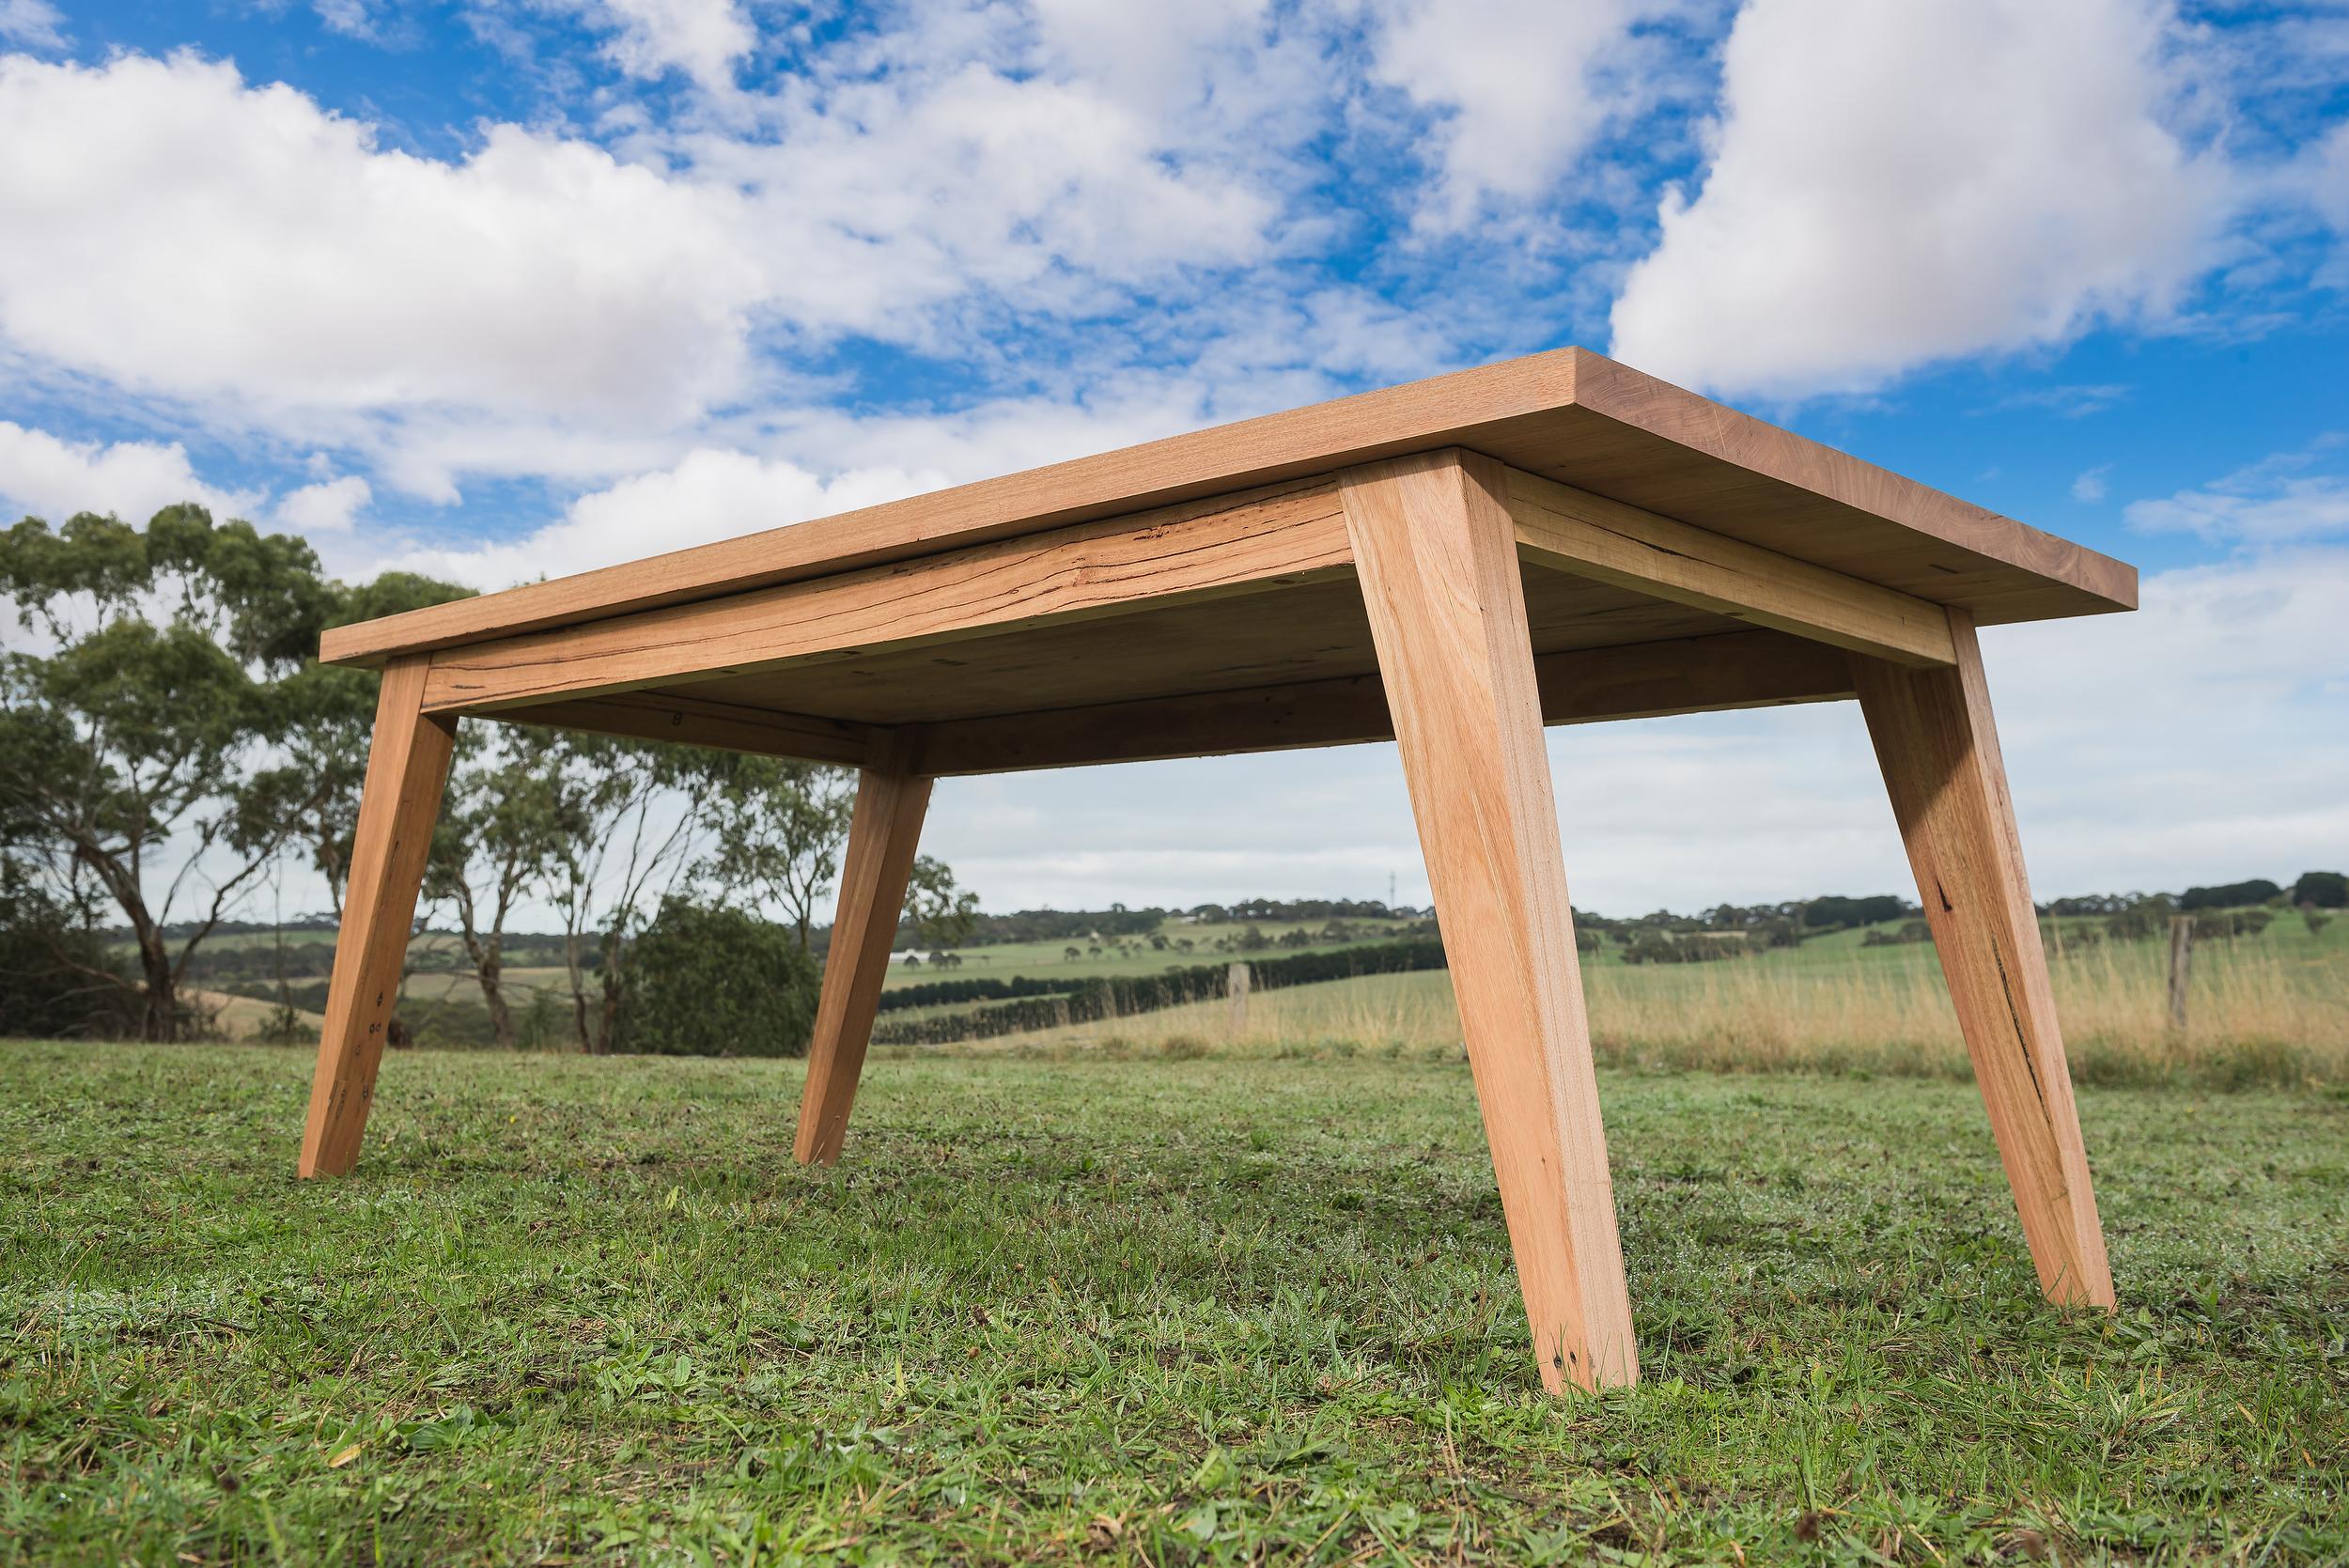 Angled leg solid timber table